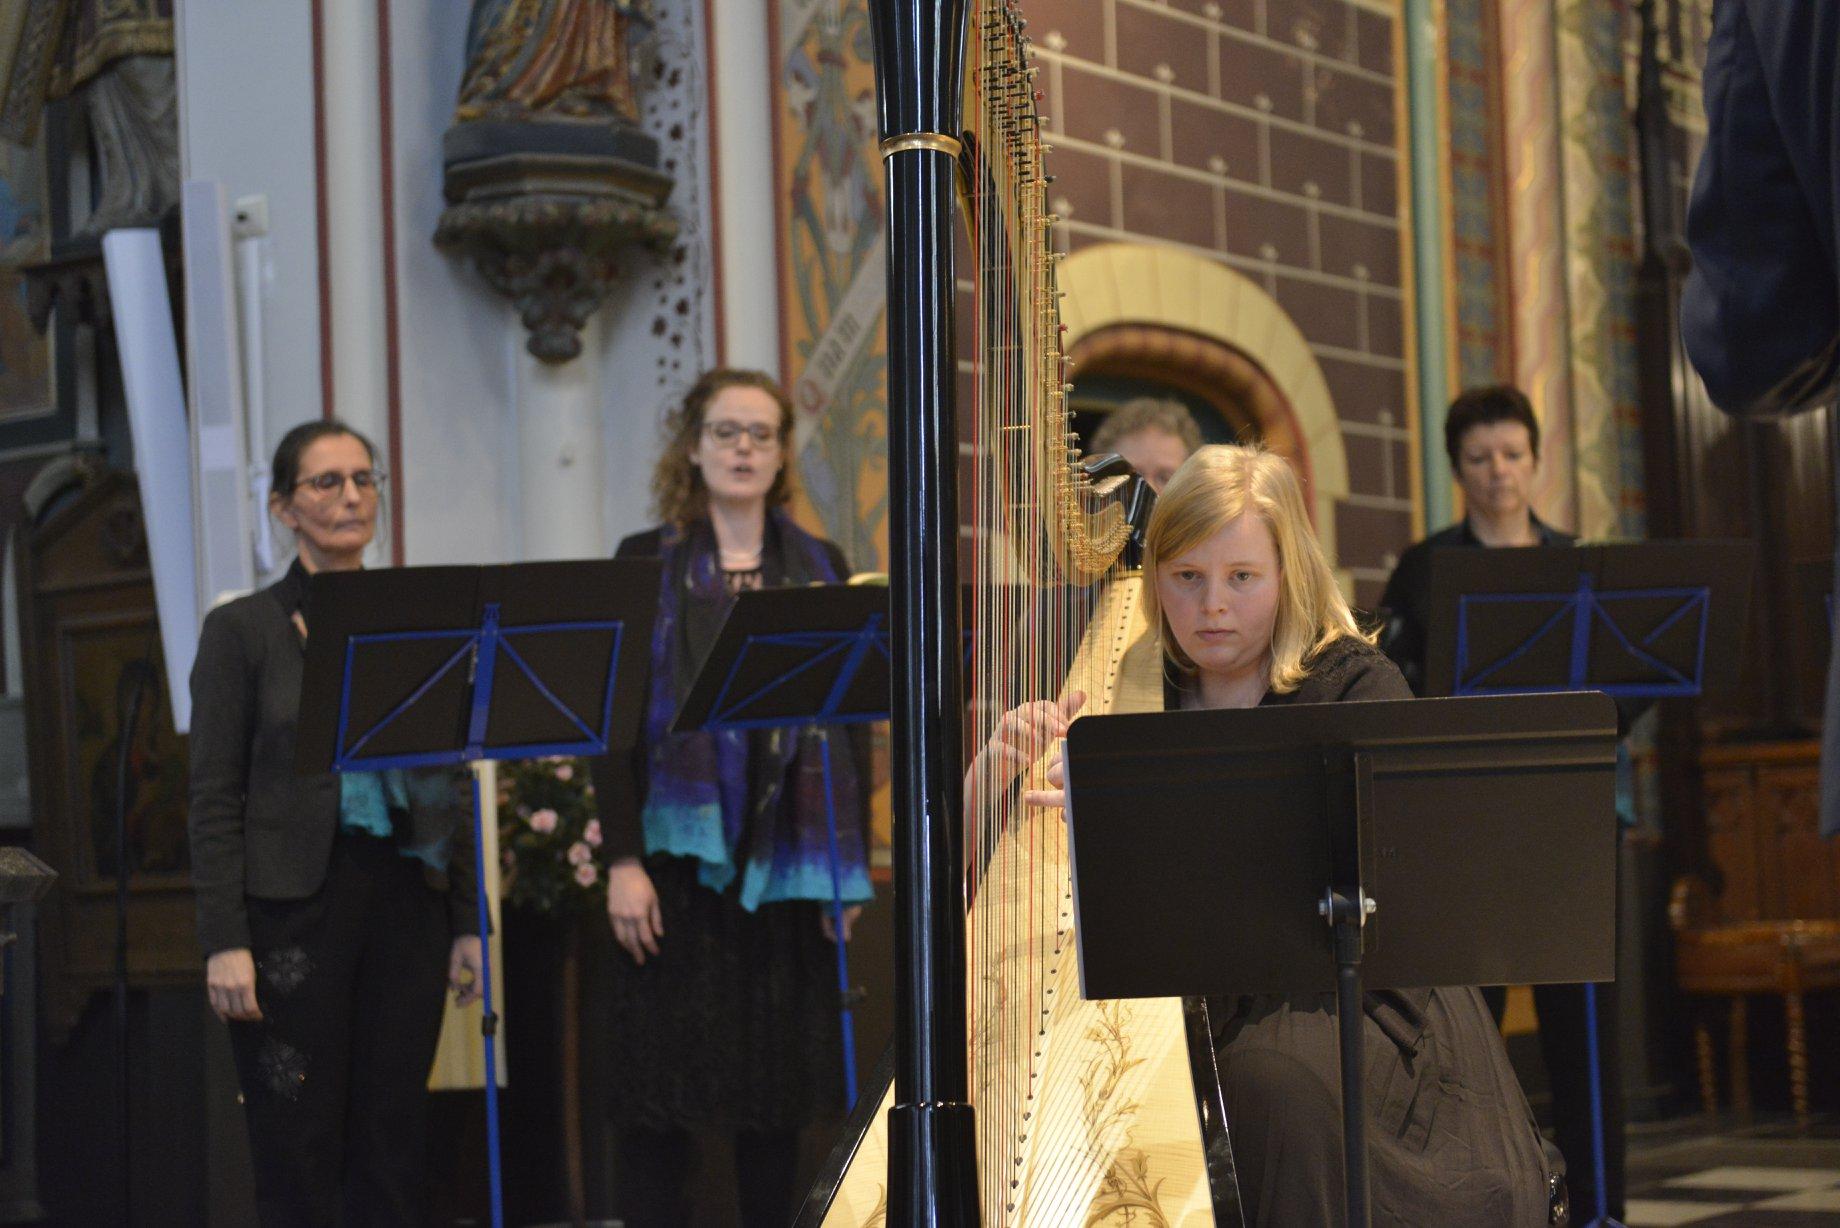 Concert Donne Domenica o.l.v. Patrick Van Looy